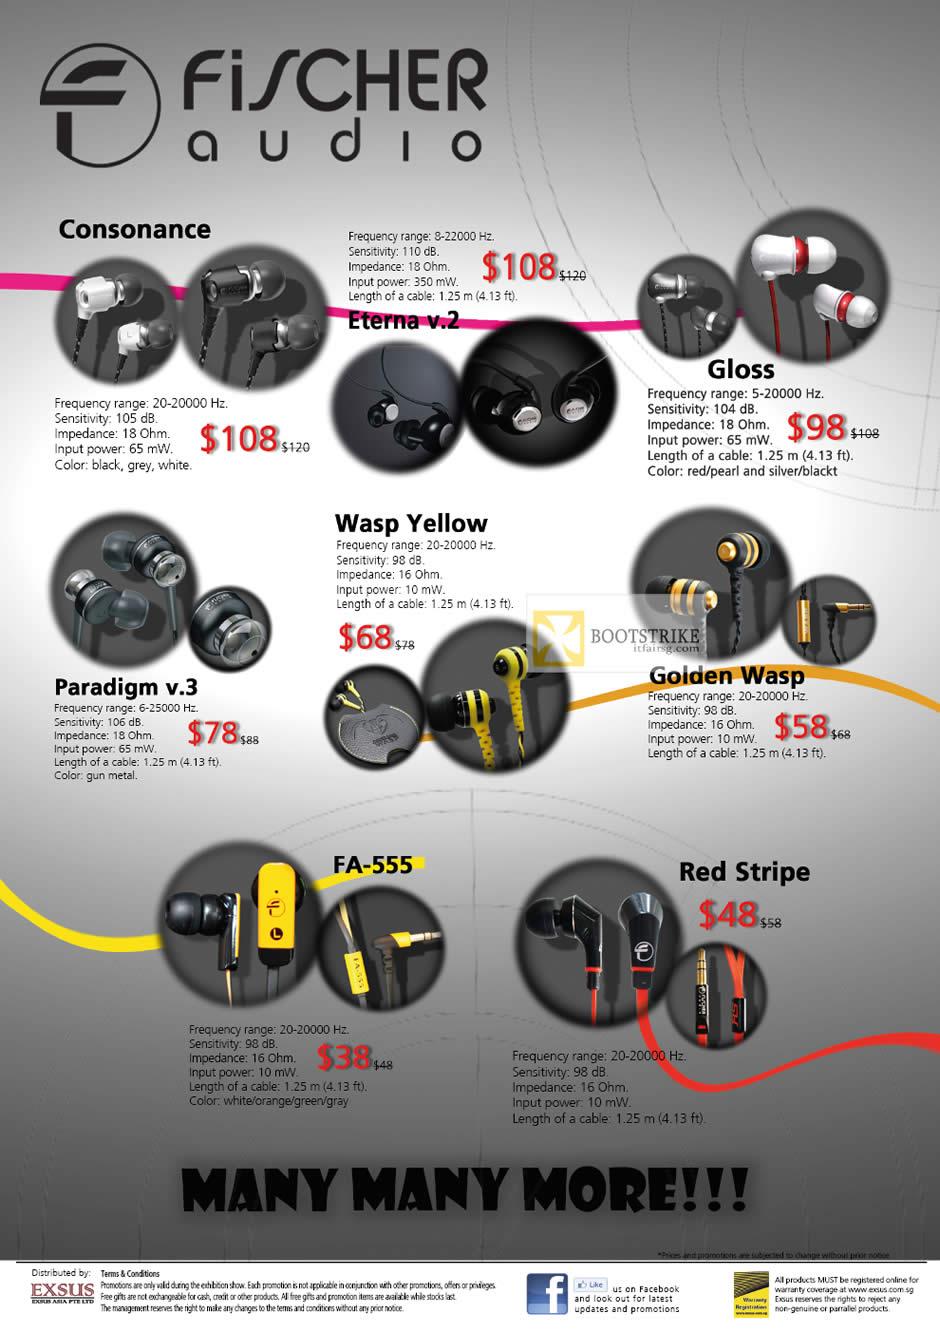 IT SHOW 2012 price list image brochure of EpiLife Fischer Audio Earphones Consonance, Eterna V.2, Gloss, Wasp Yellow, Golden Wasp, Paradigm V.3, FA-555, Red Stripe